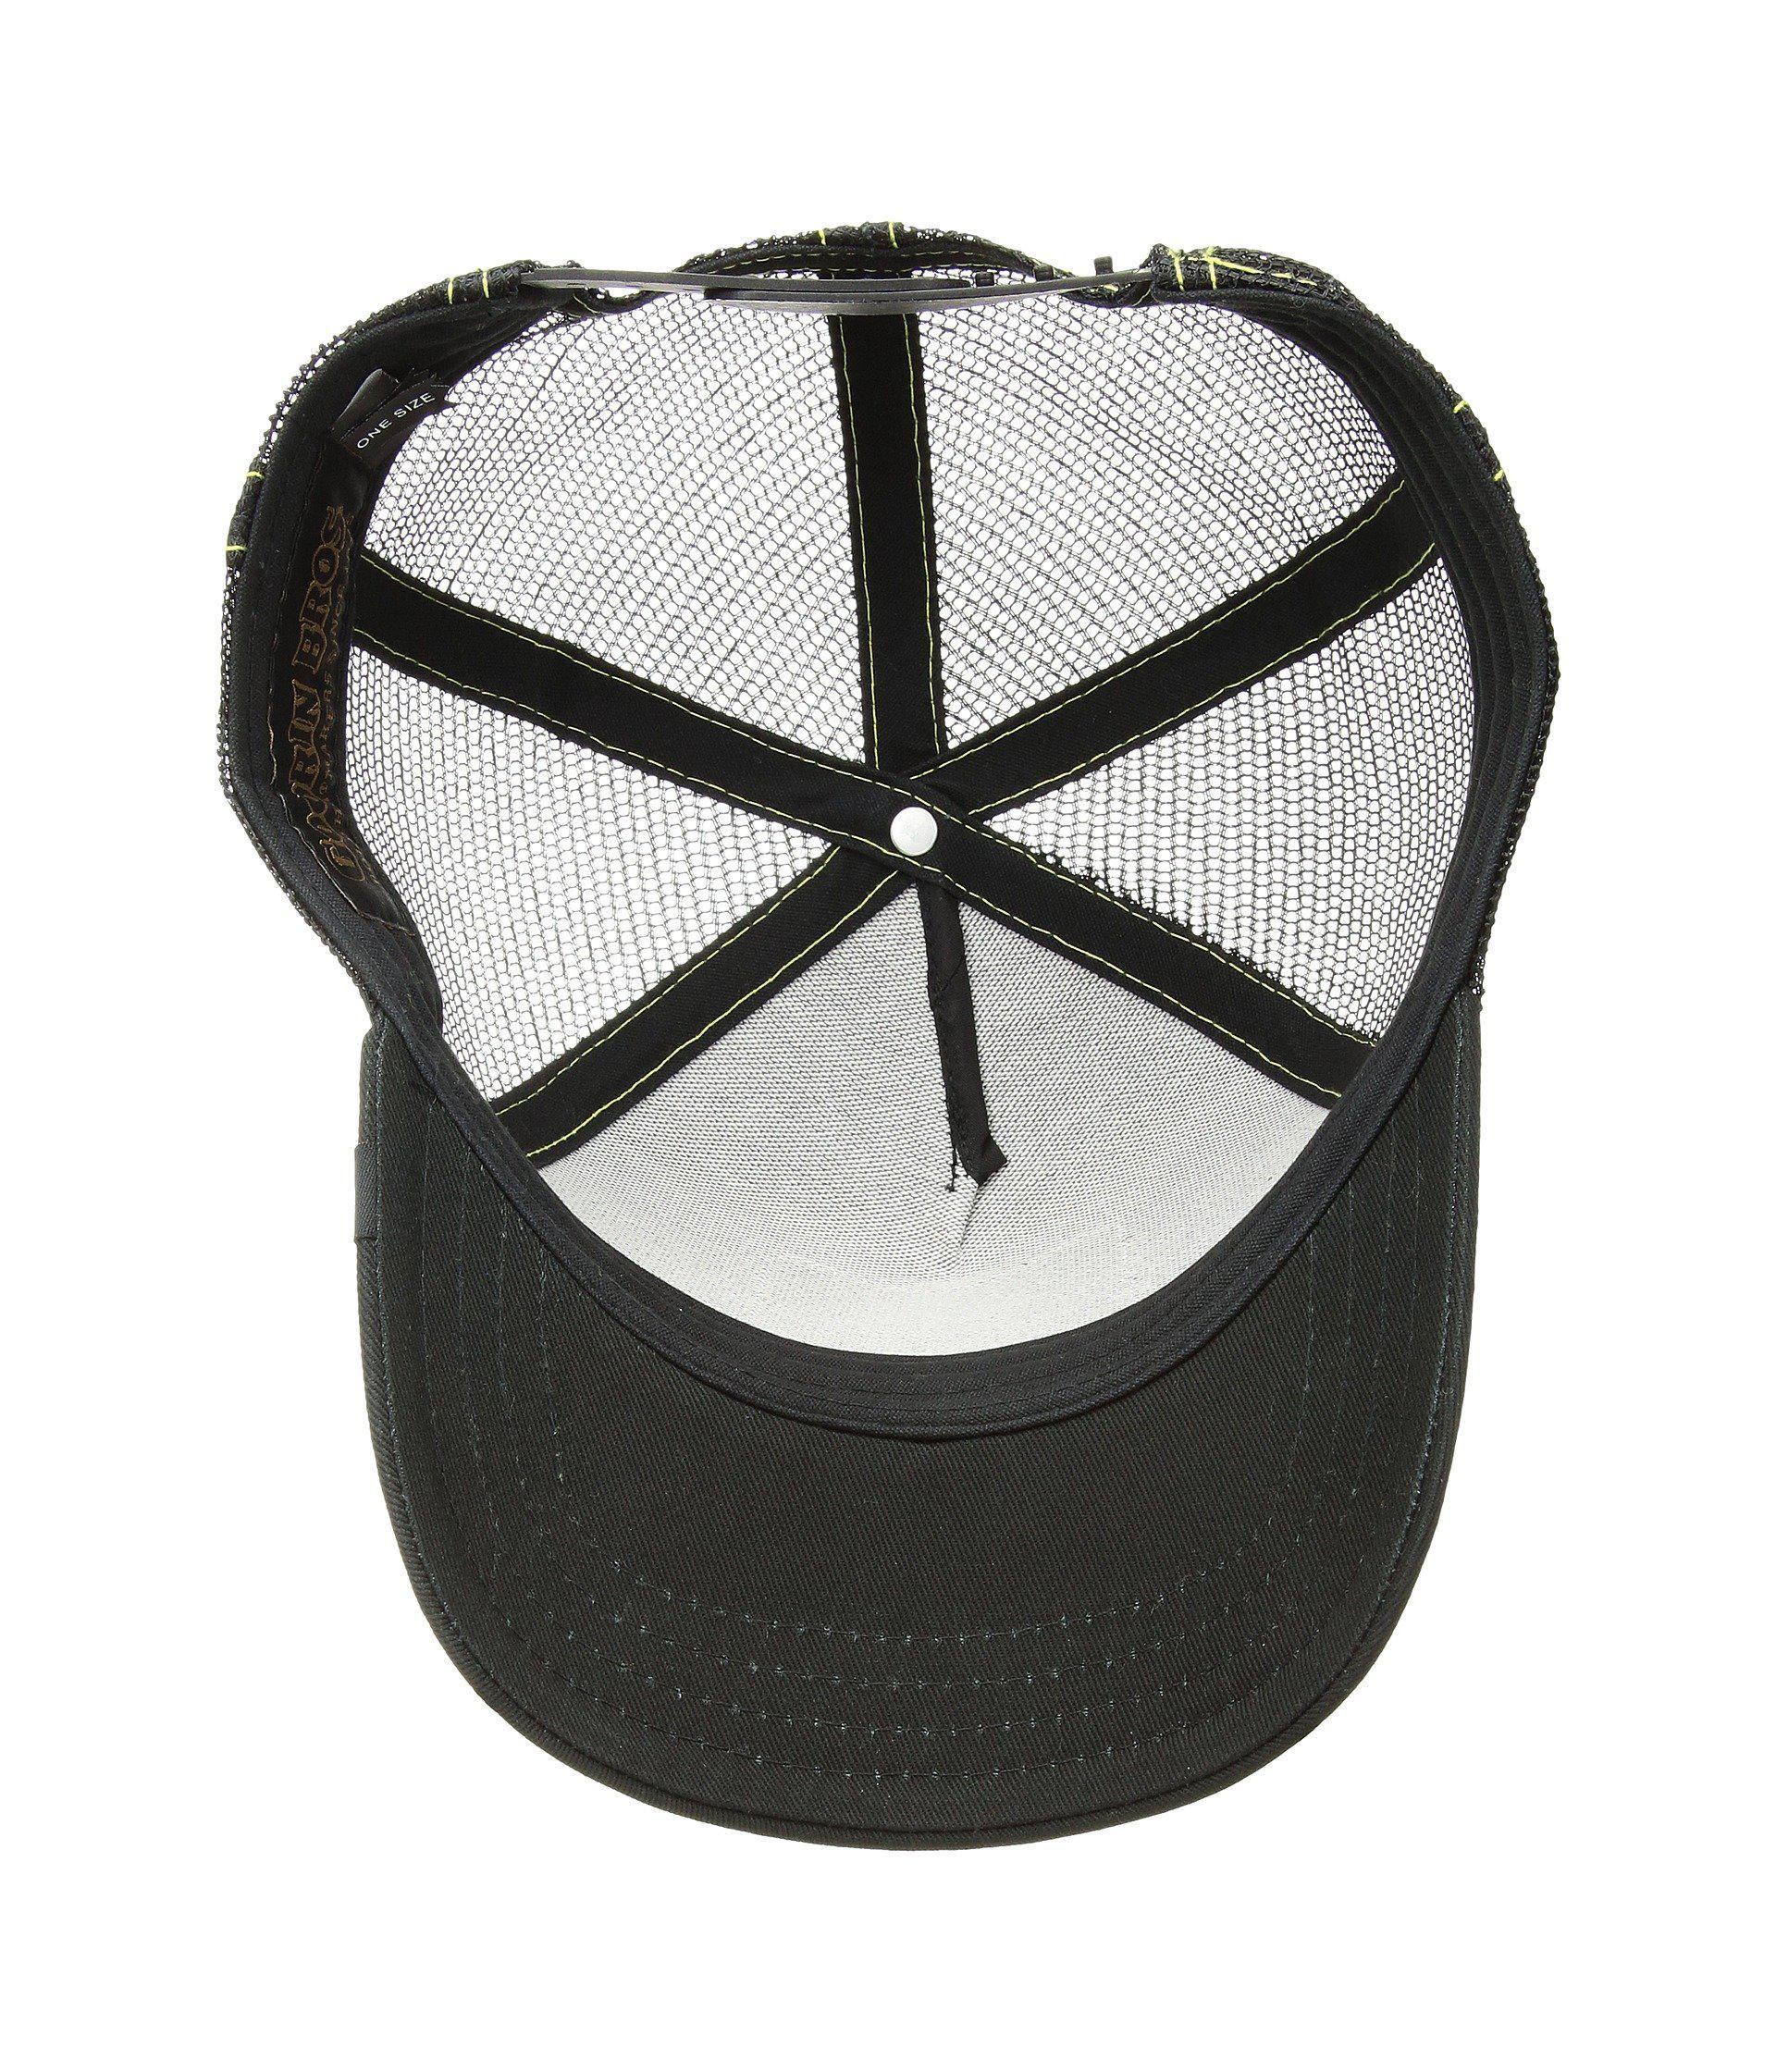 Lyst - Goorin Bros Animal Farm Snap Back Trucker Hat (olive Donkey) Caps in  Black for Men b1de846f64bf